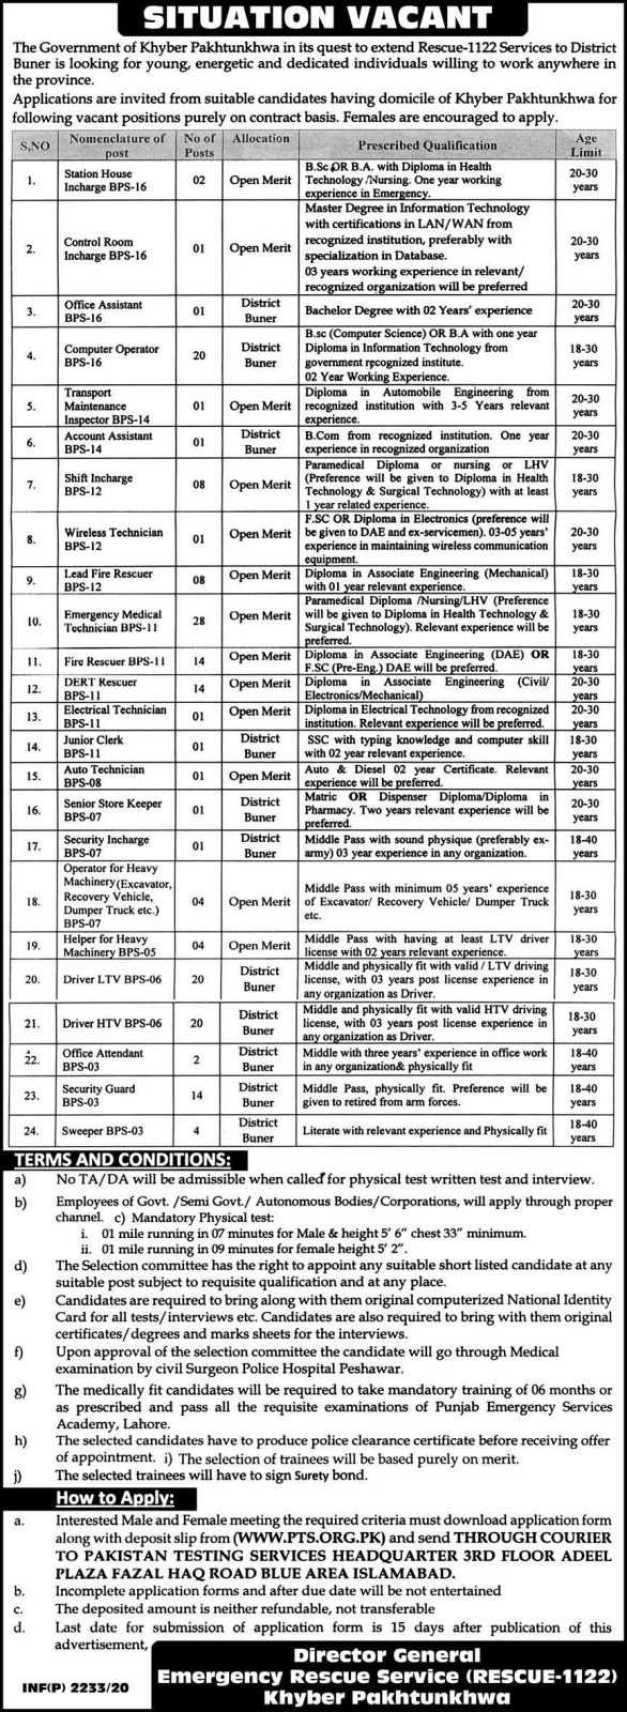 Rescue 1122 Khyber Pakhtunkhwa Jobs 2020